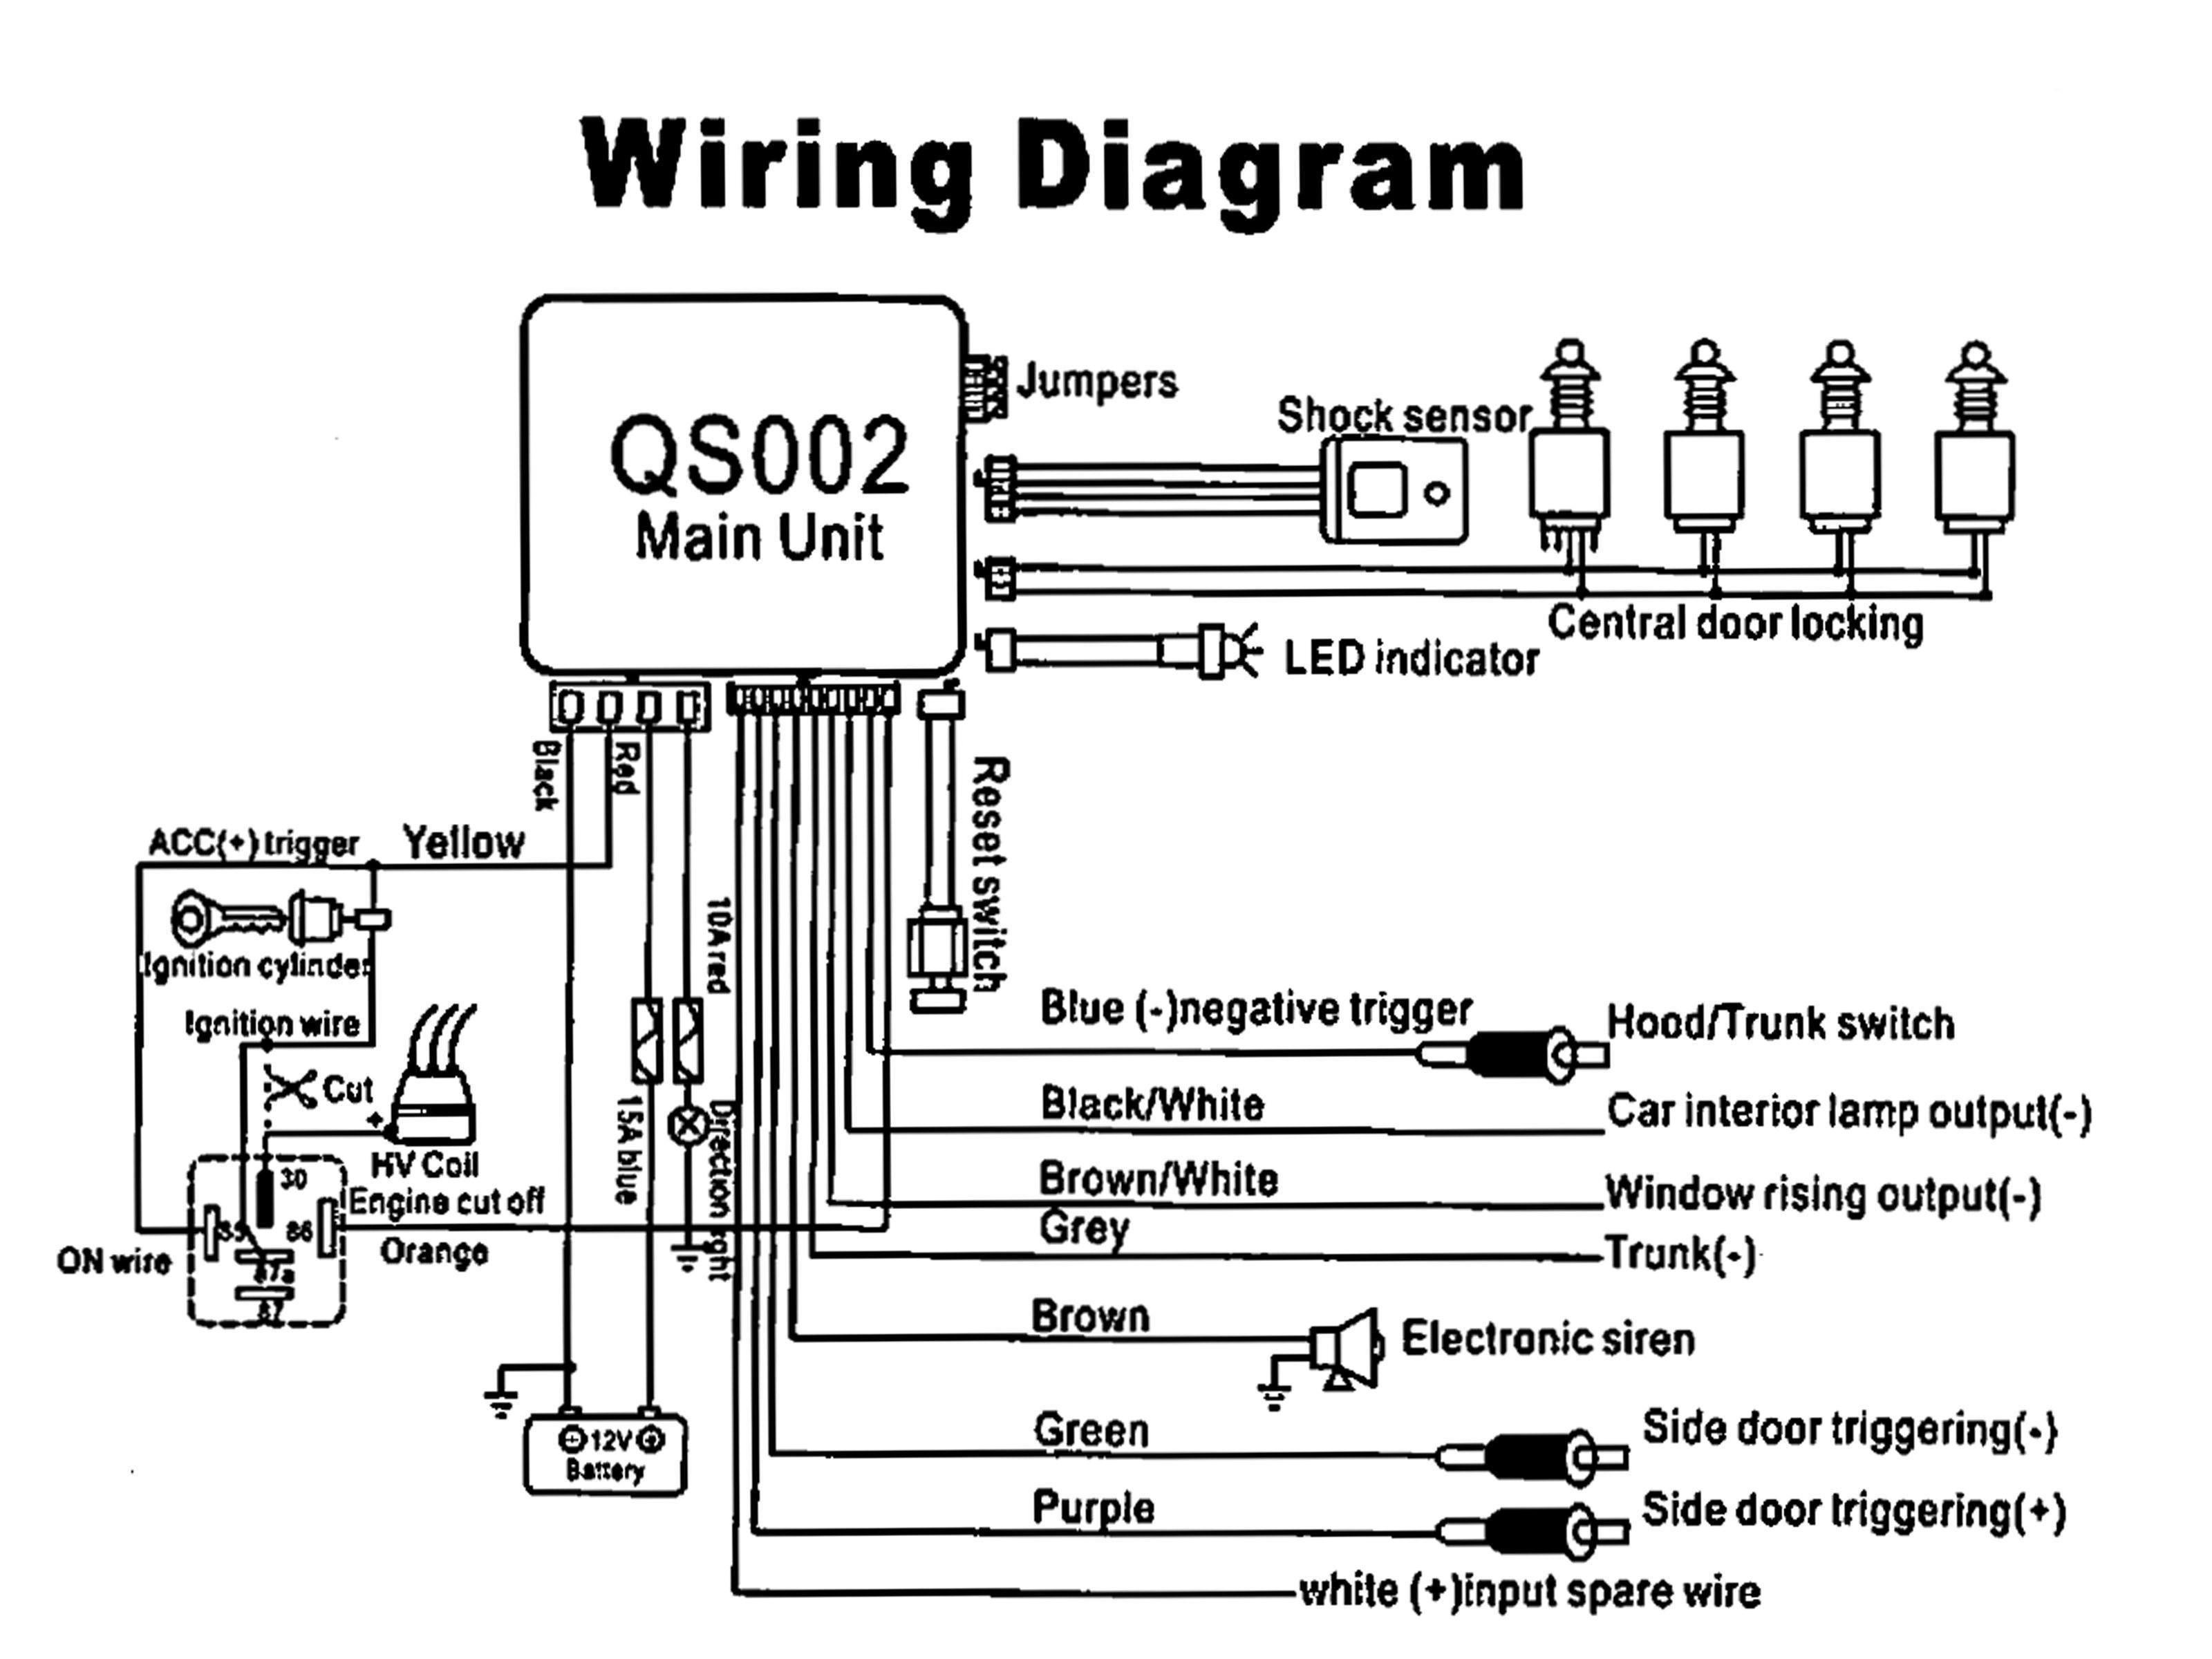 Car Immobiliser Wiring Diagram | Wiring Diagram on